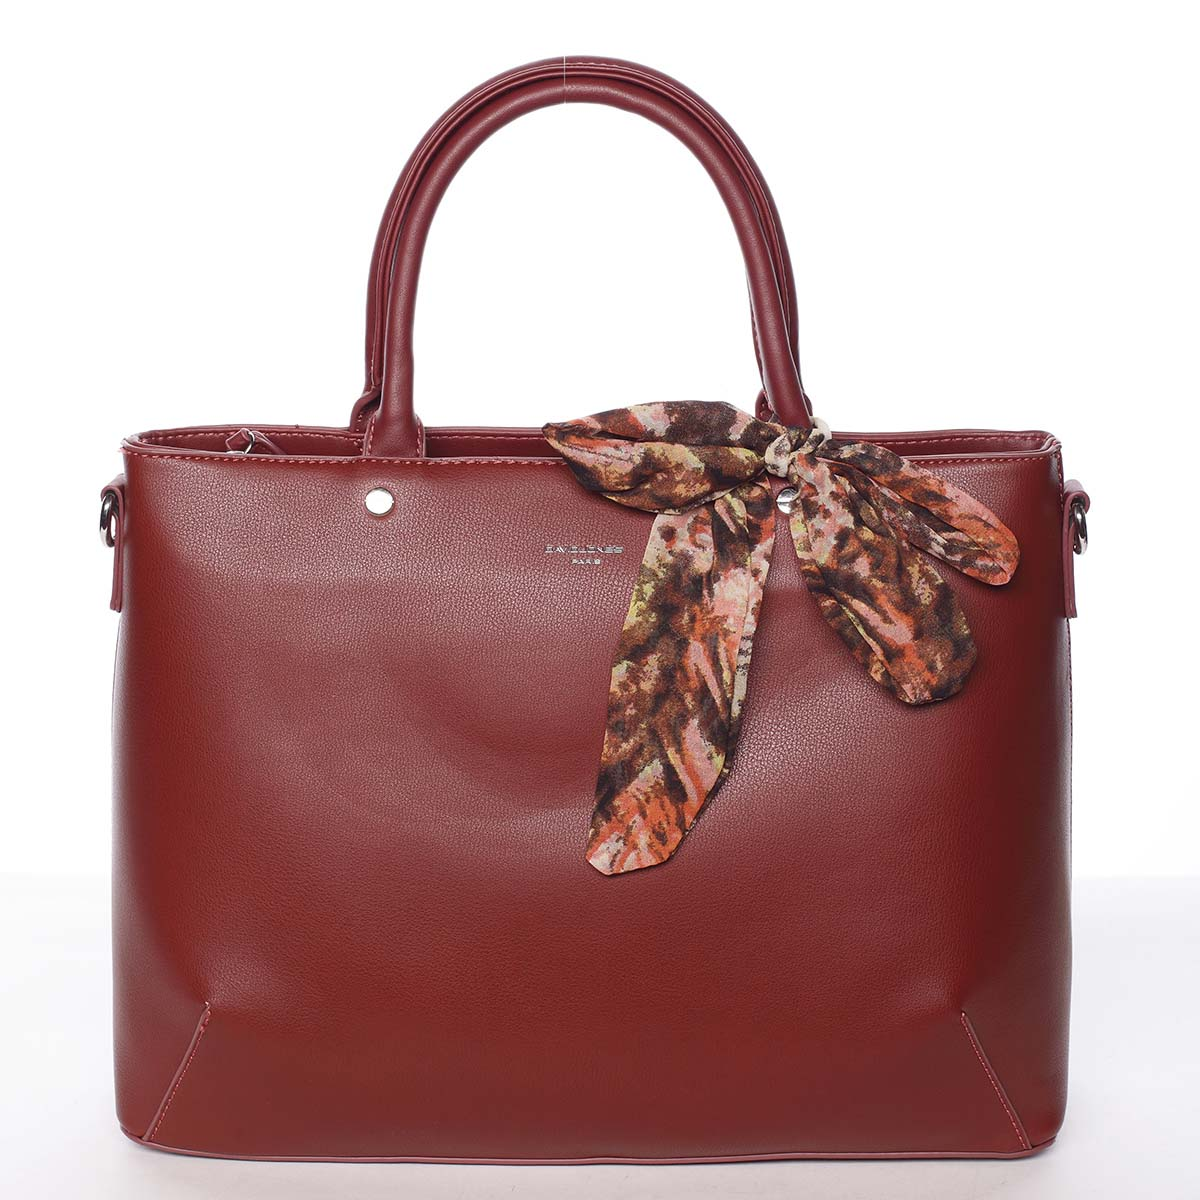 Módna dámska tmavočervená kabelka s mašľou - David Jones Harriet